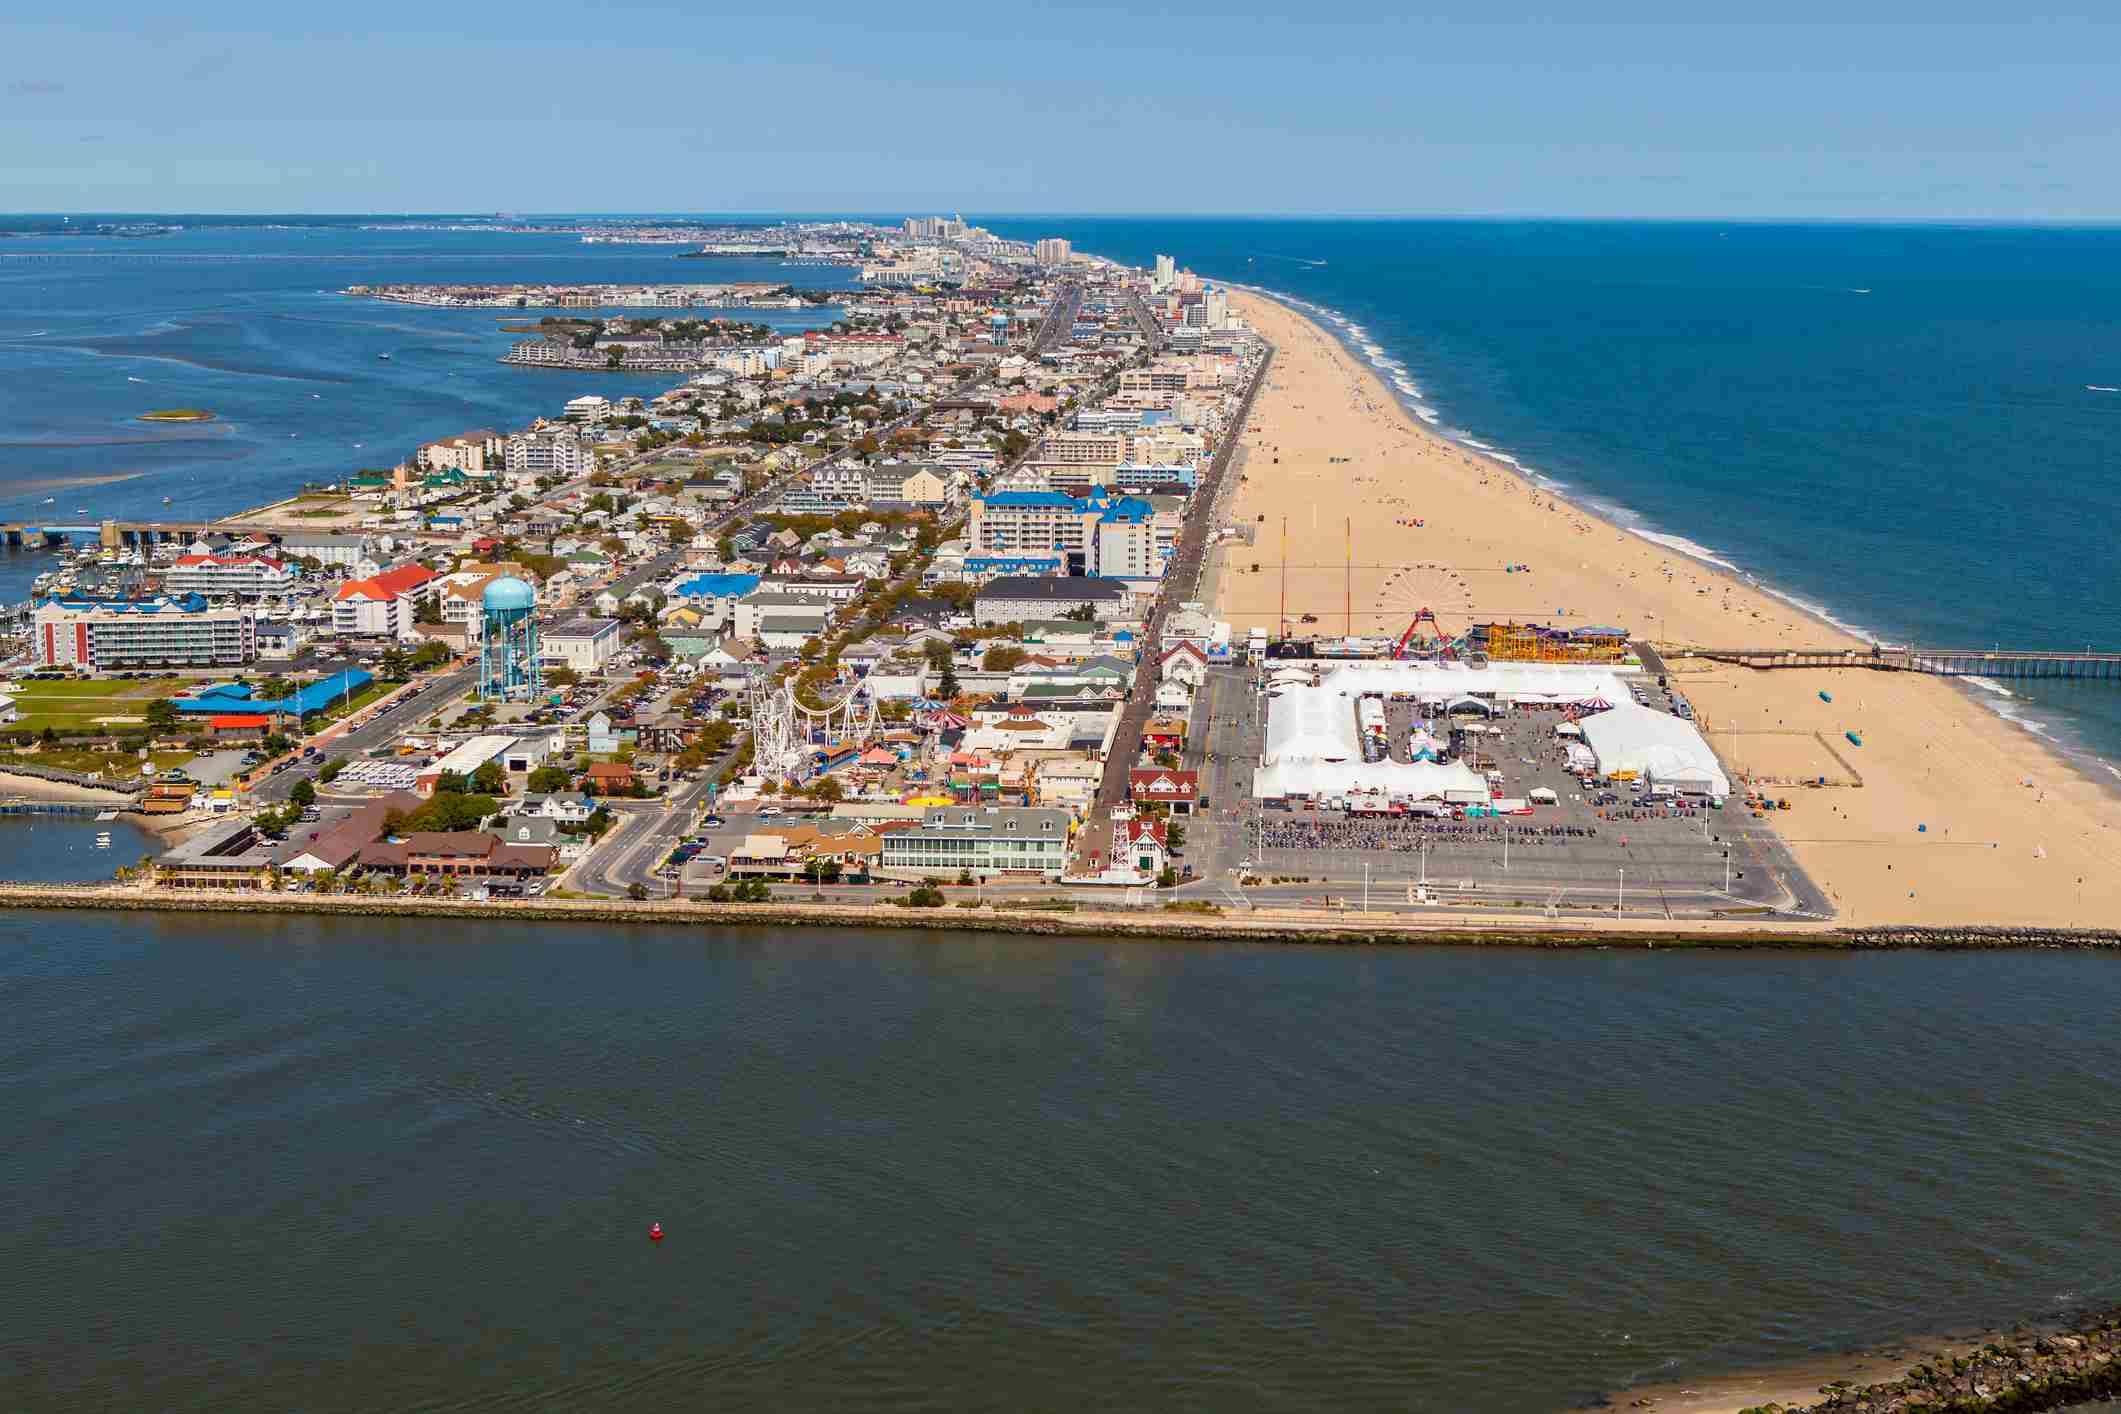 Aerial view of Ocean City, MD